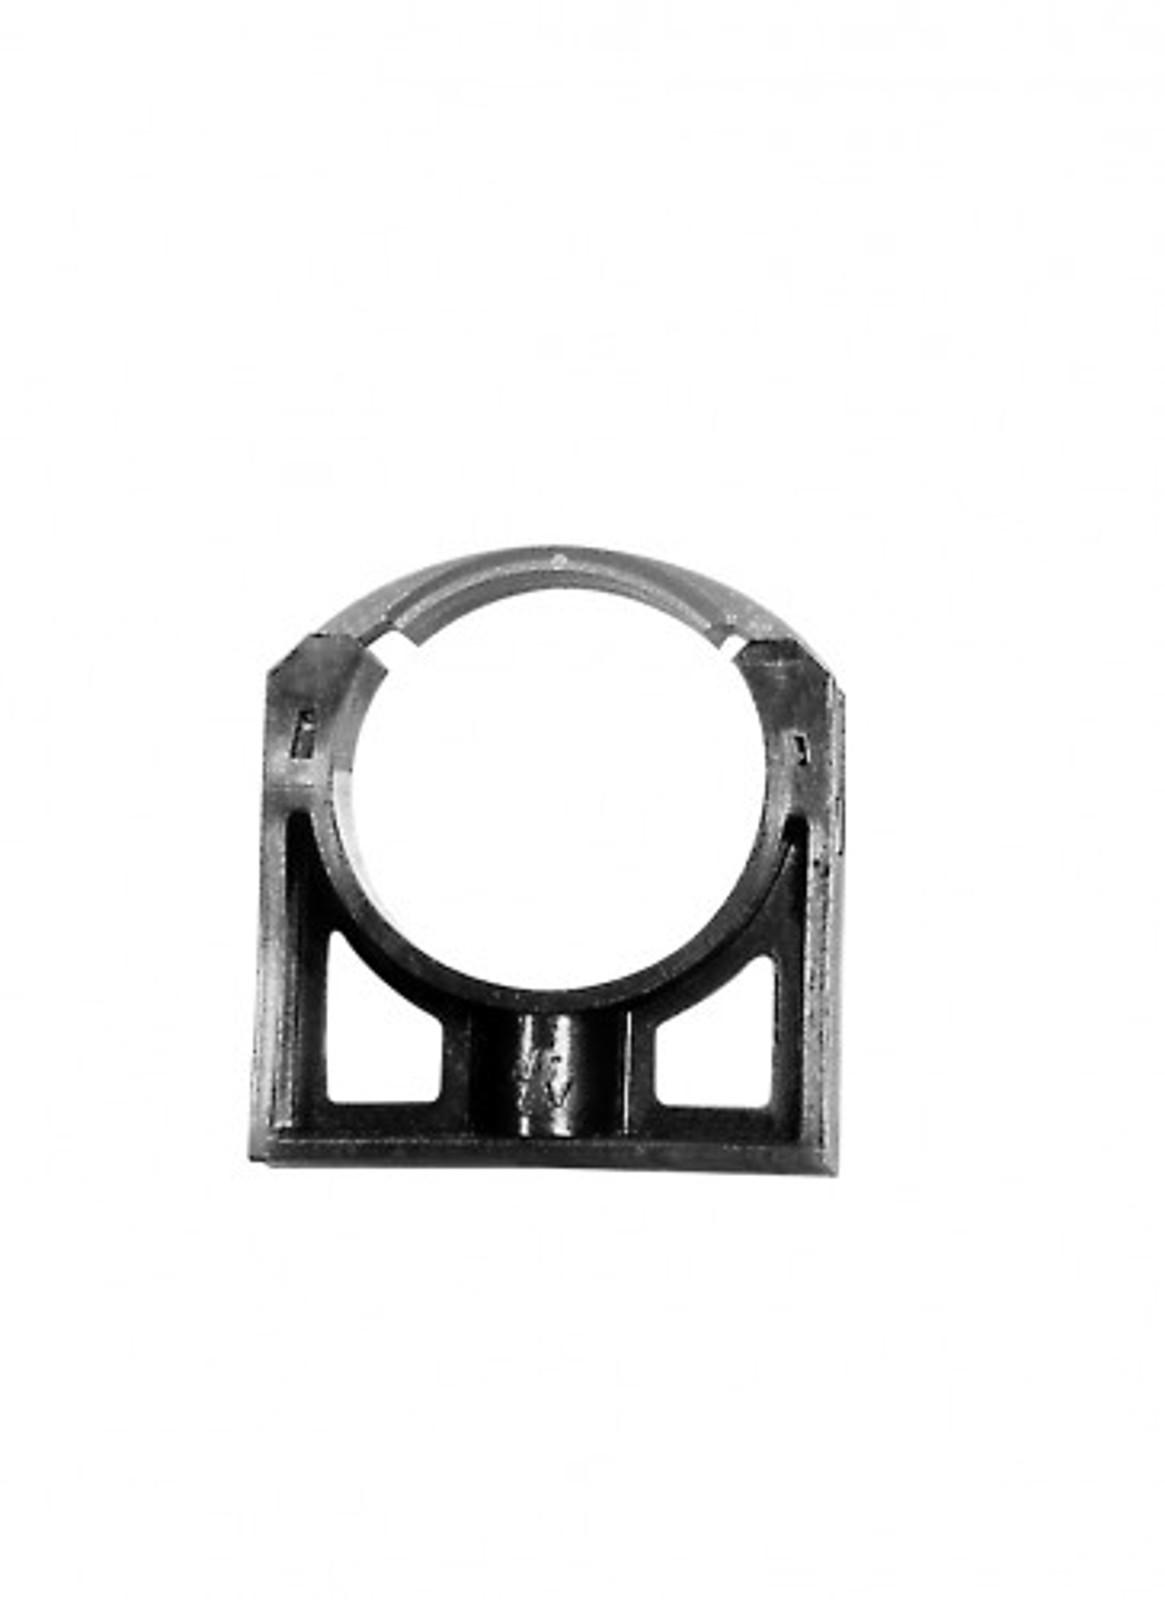 Rohrschelle, 90 mm aus PVC